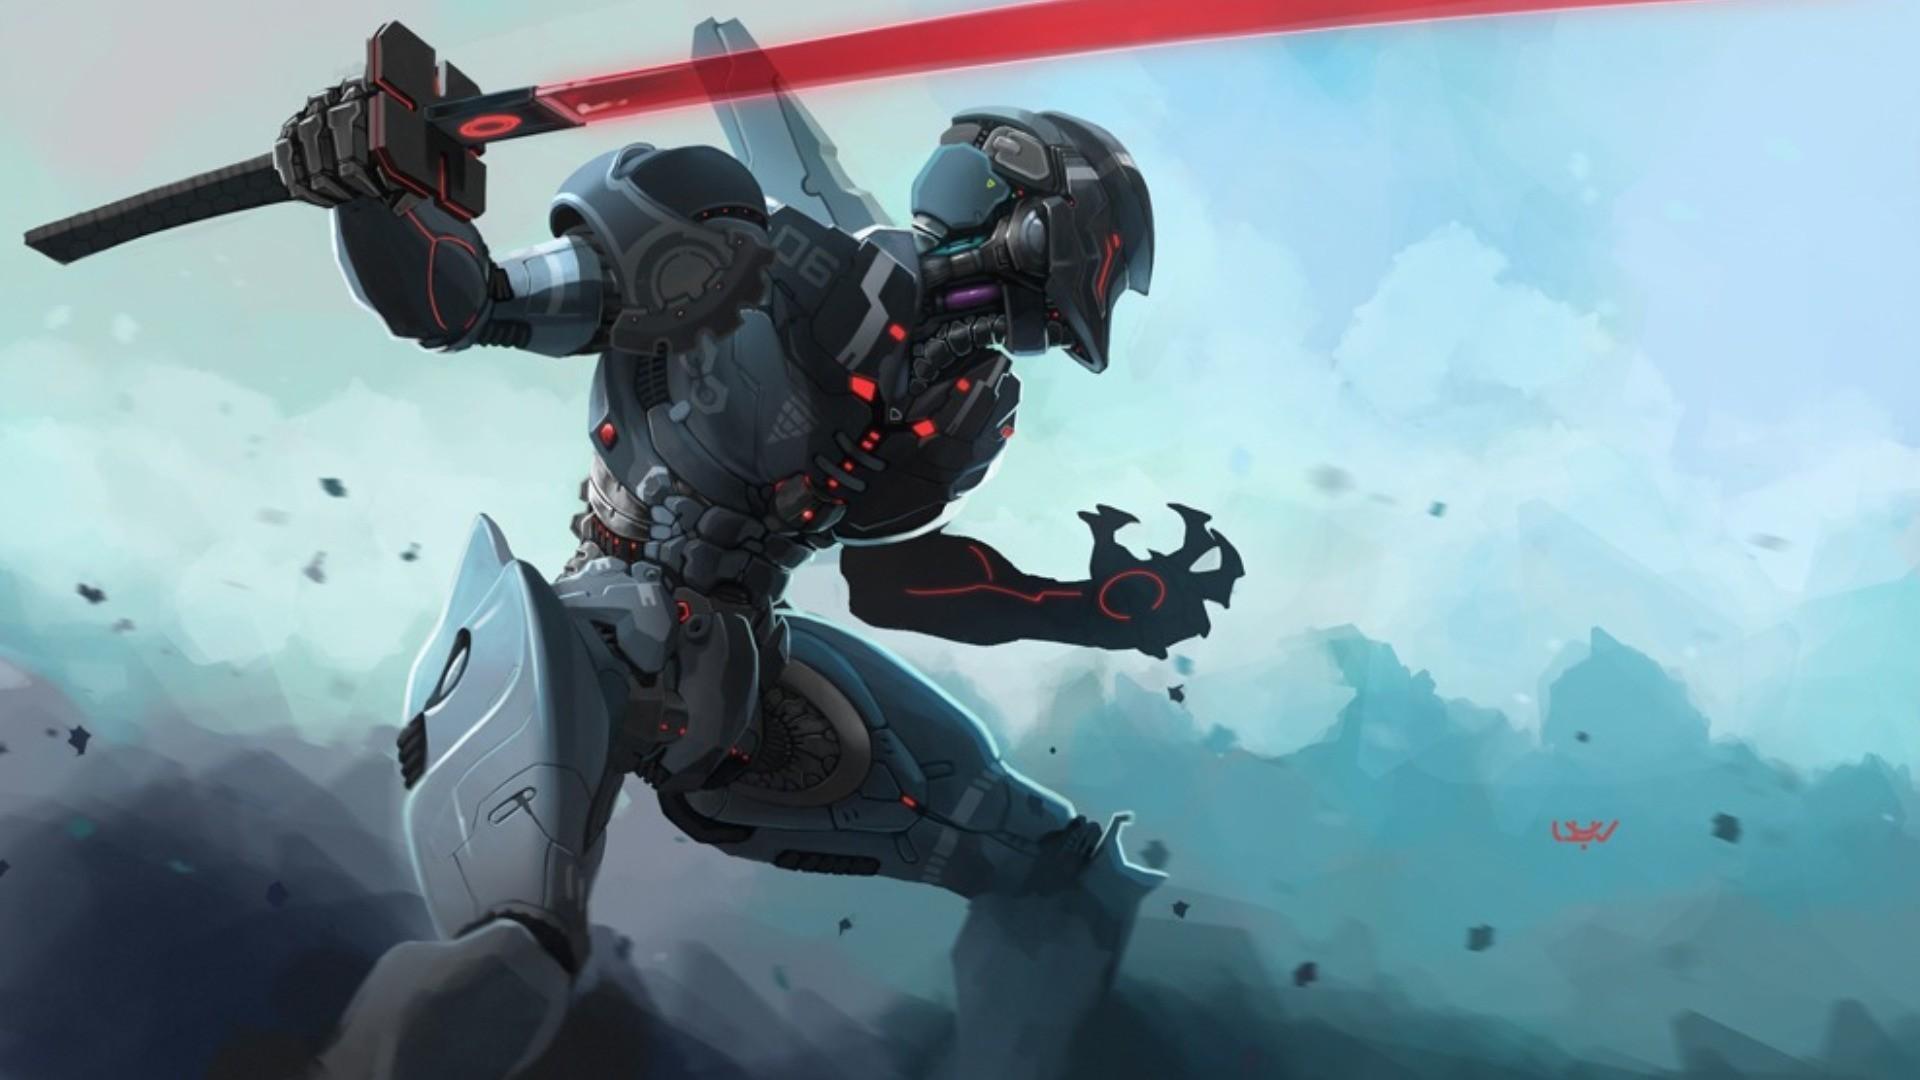 artwork, Cyborg, Futuristic, Samurai Wallpapers HD / Desktop and Mobile  Backgrounds